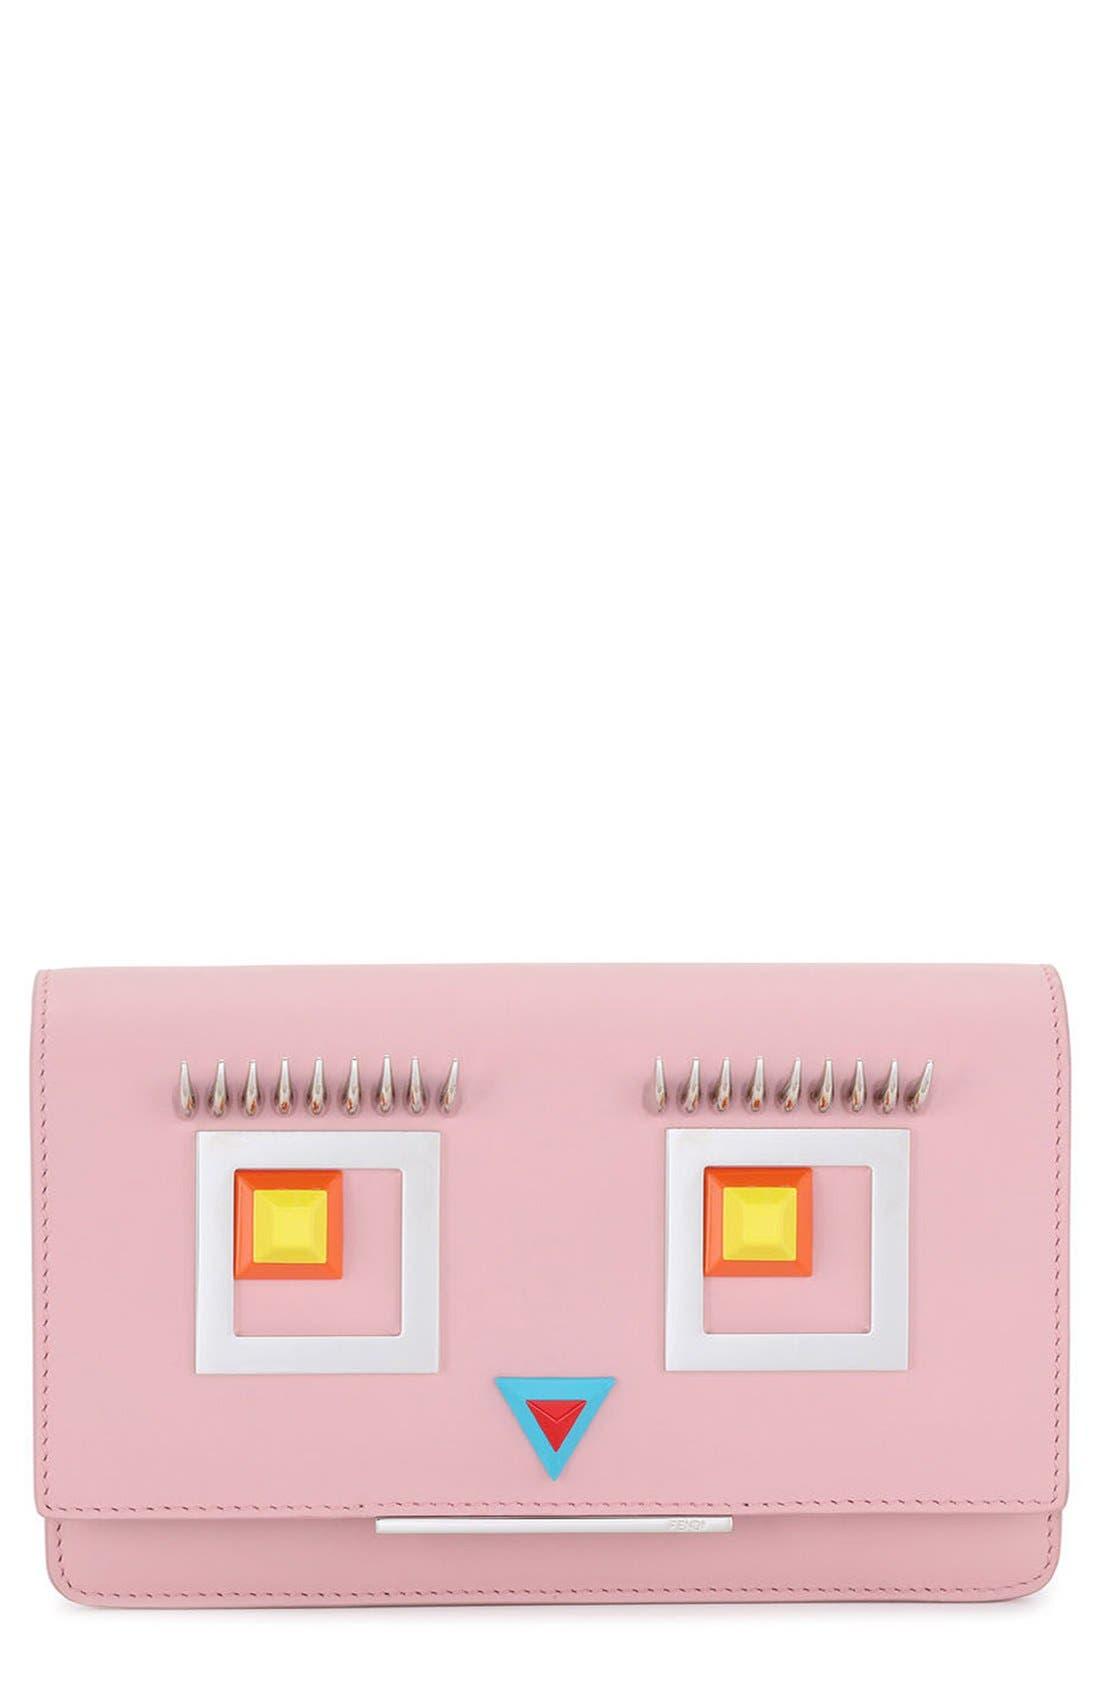 Alternate Image 1 Selected - Fendi Square Eyes Leather Wallet